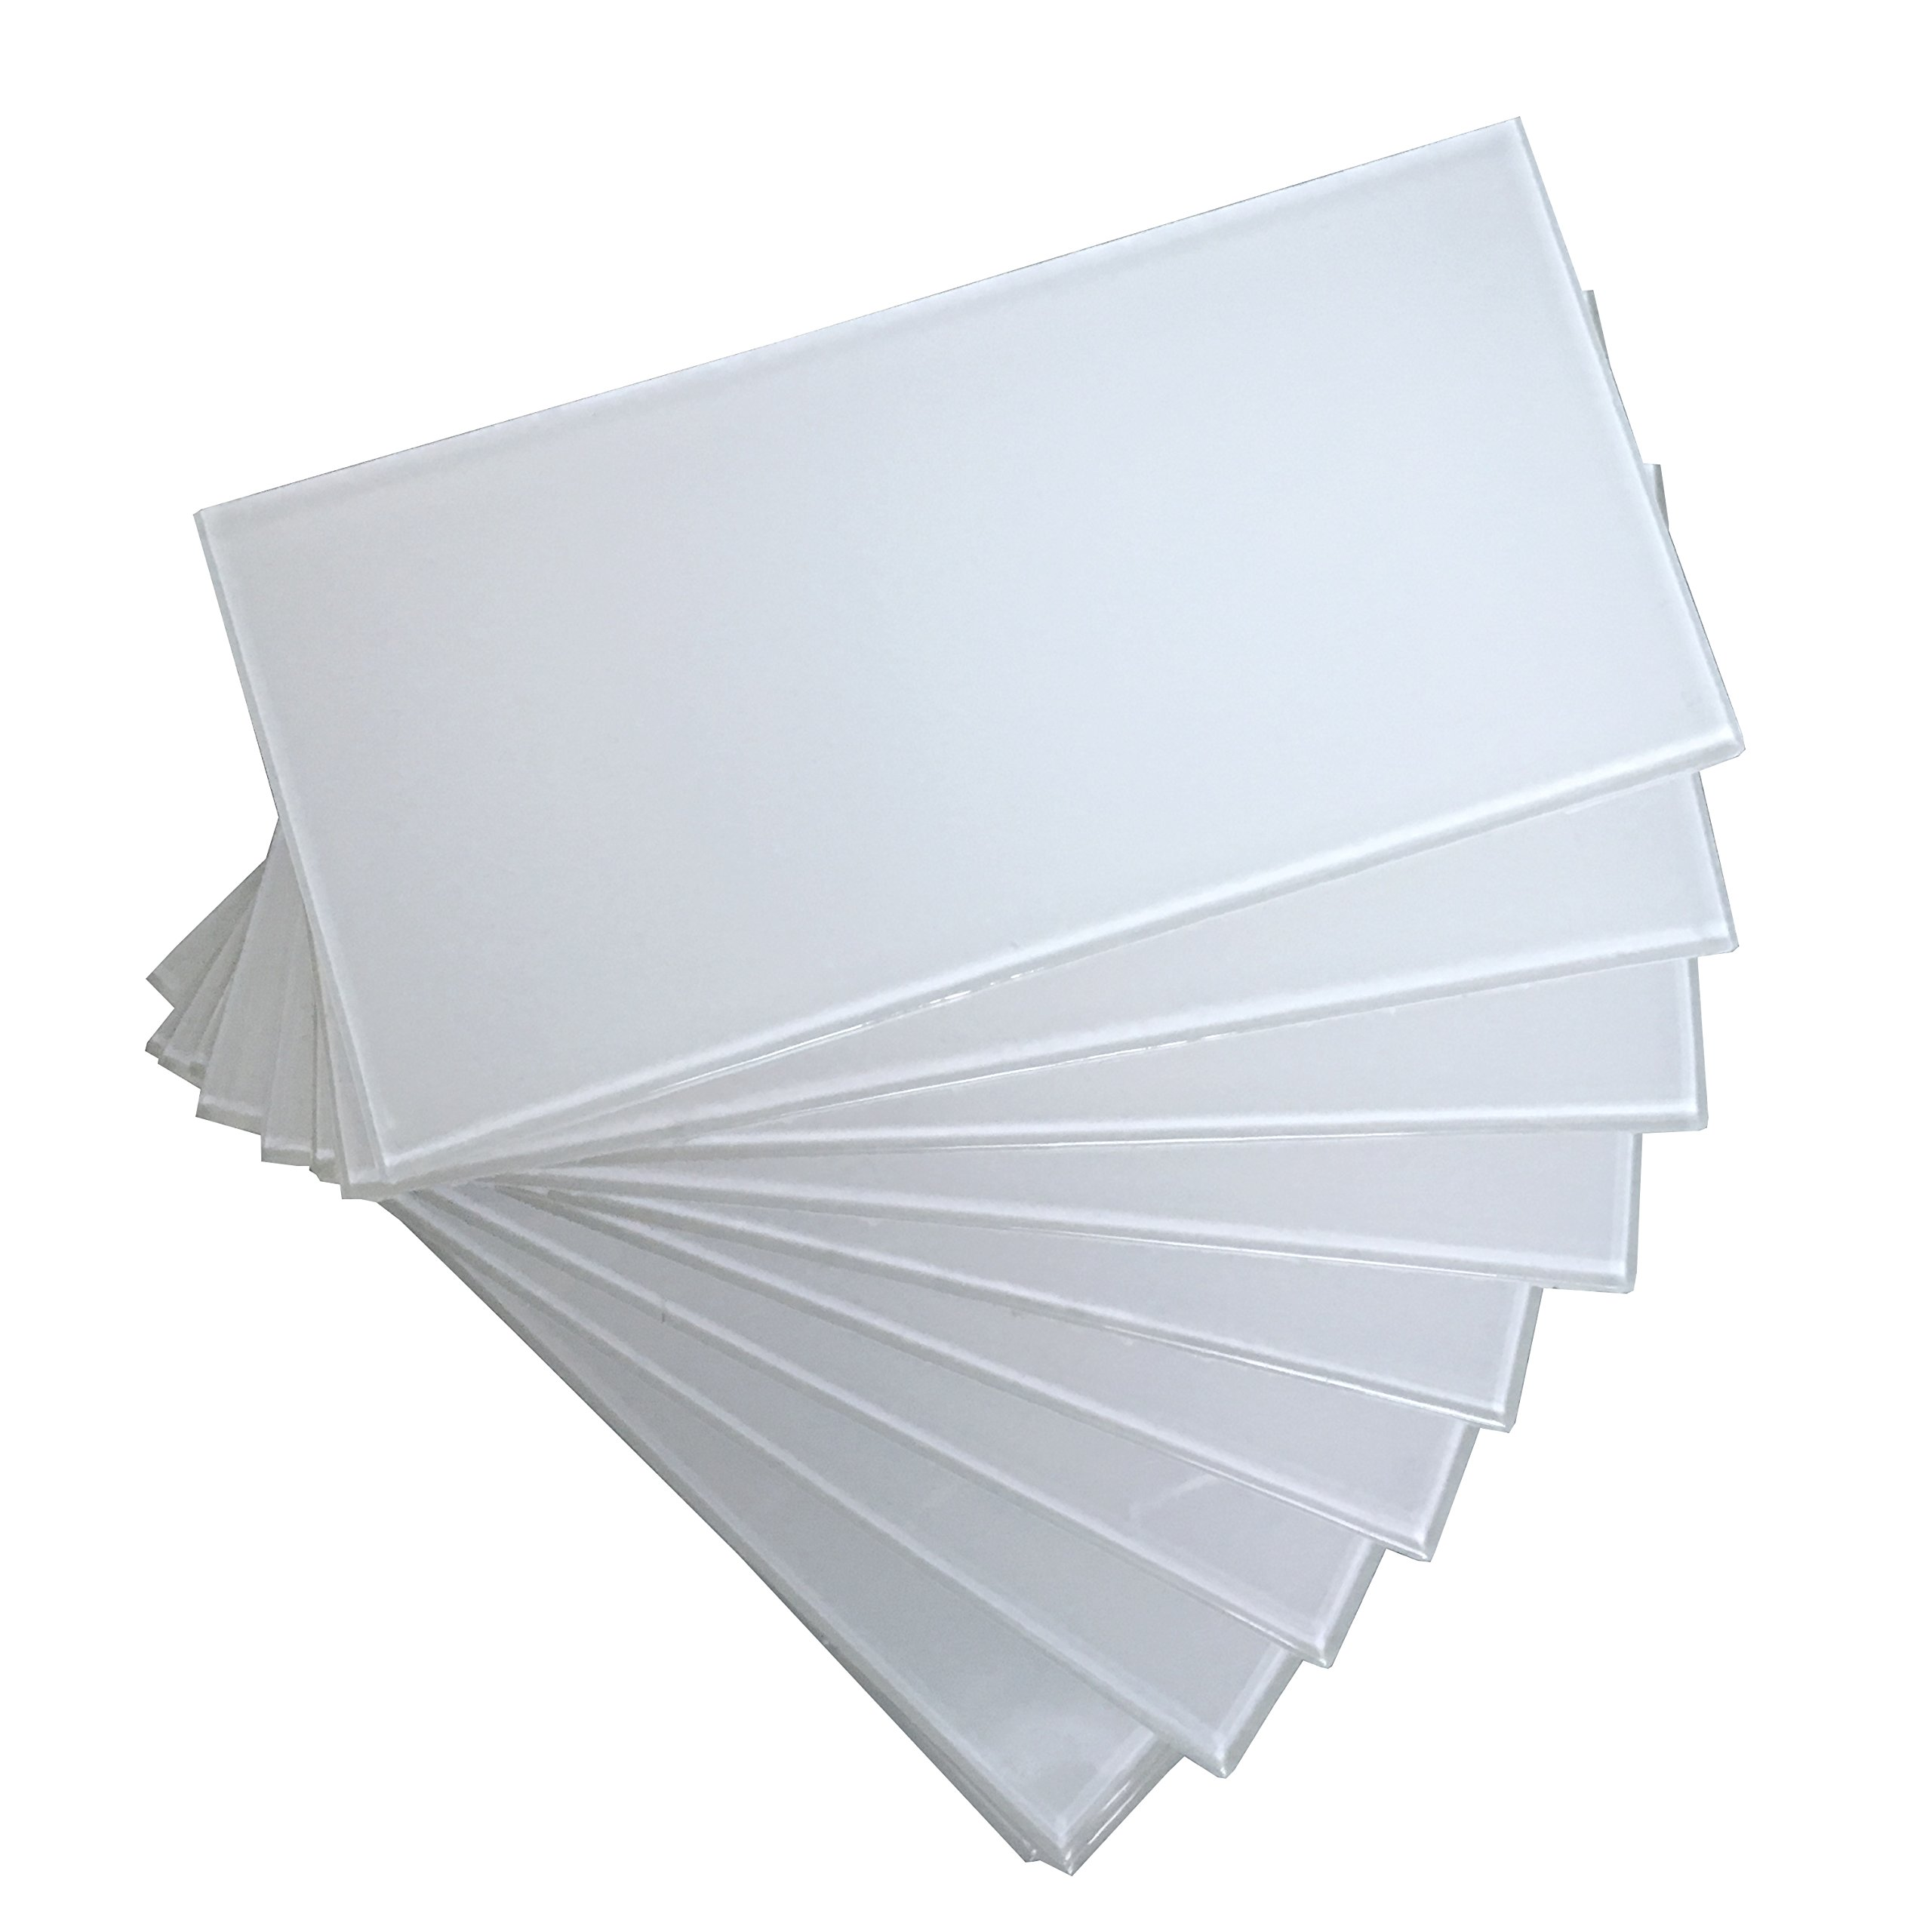 Art3d 32-Piece Peel and Stick Backsplash Glass Tile for Kitchen or Bathroom, 3'' x 6'' Subway White Backsplash Tiles